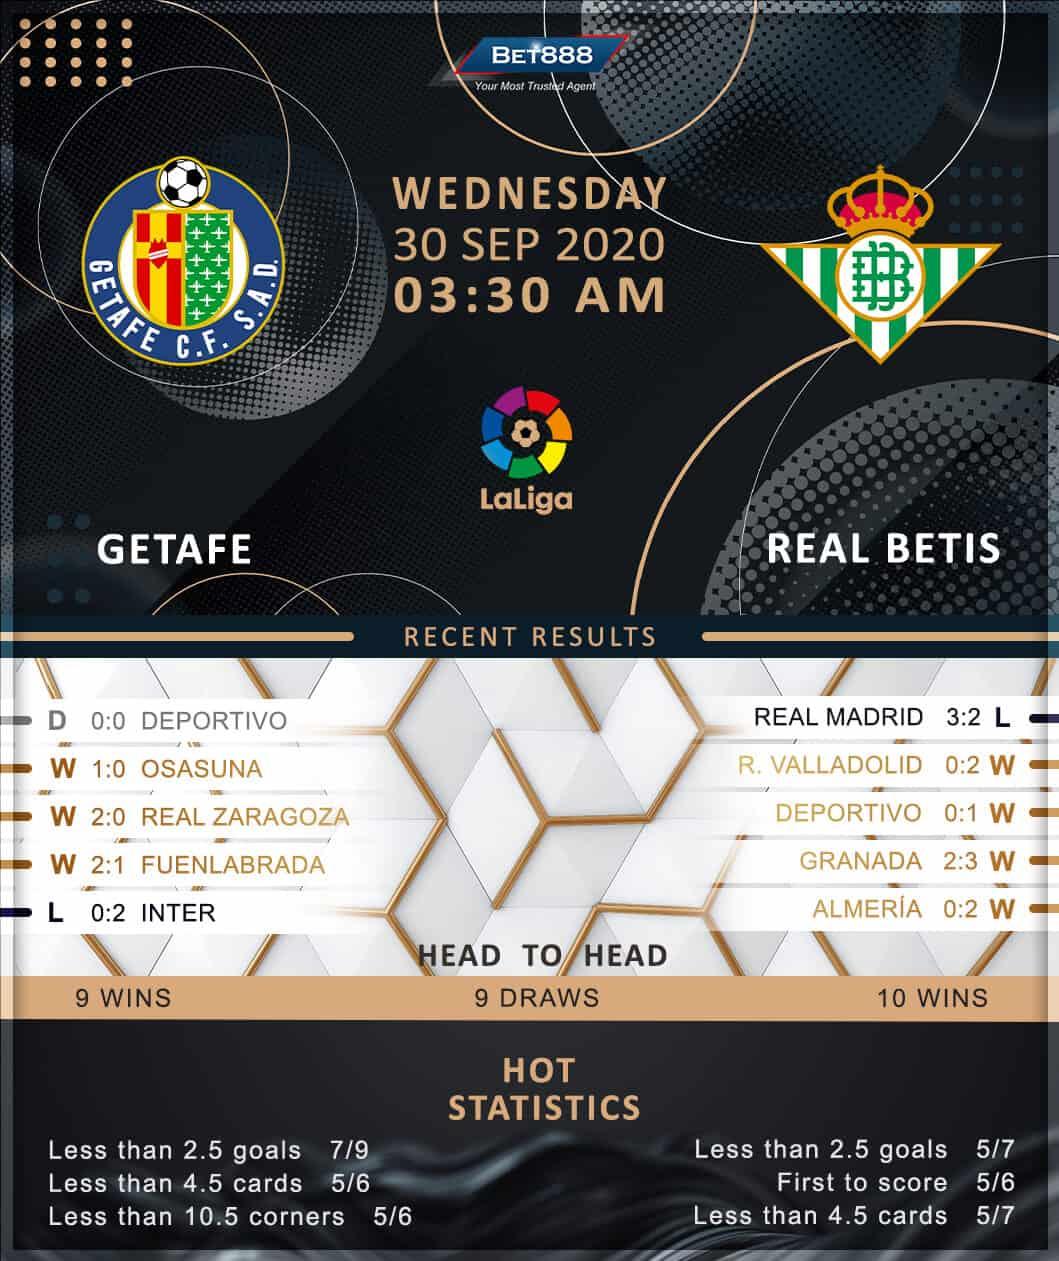 Getafe vs Real Betis 30/09/20